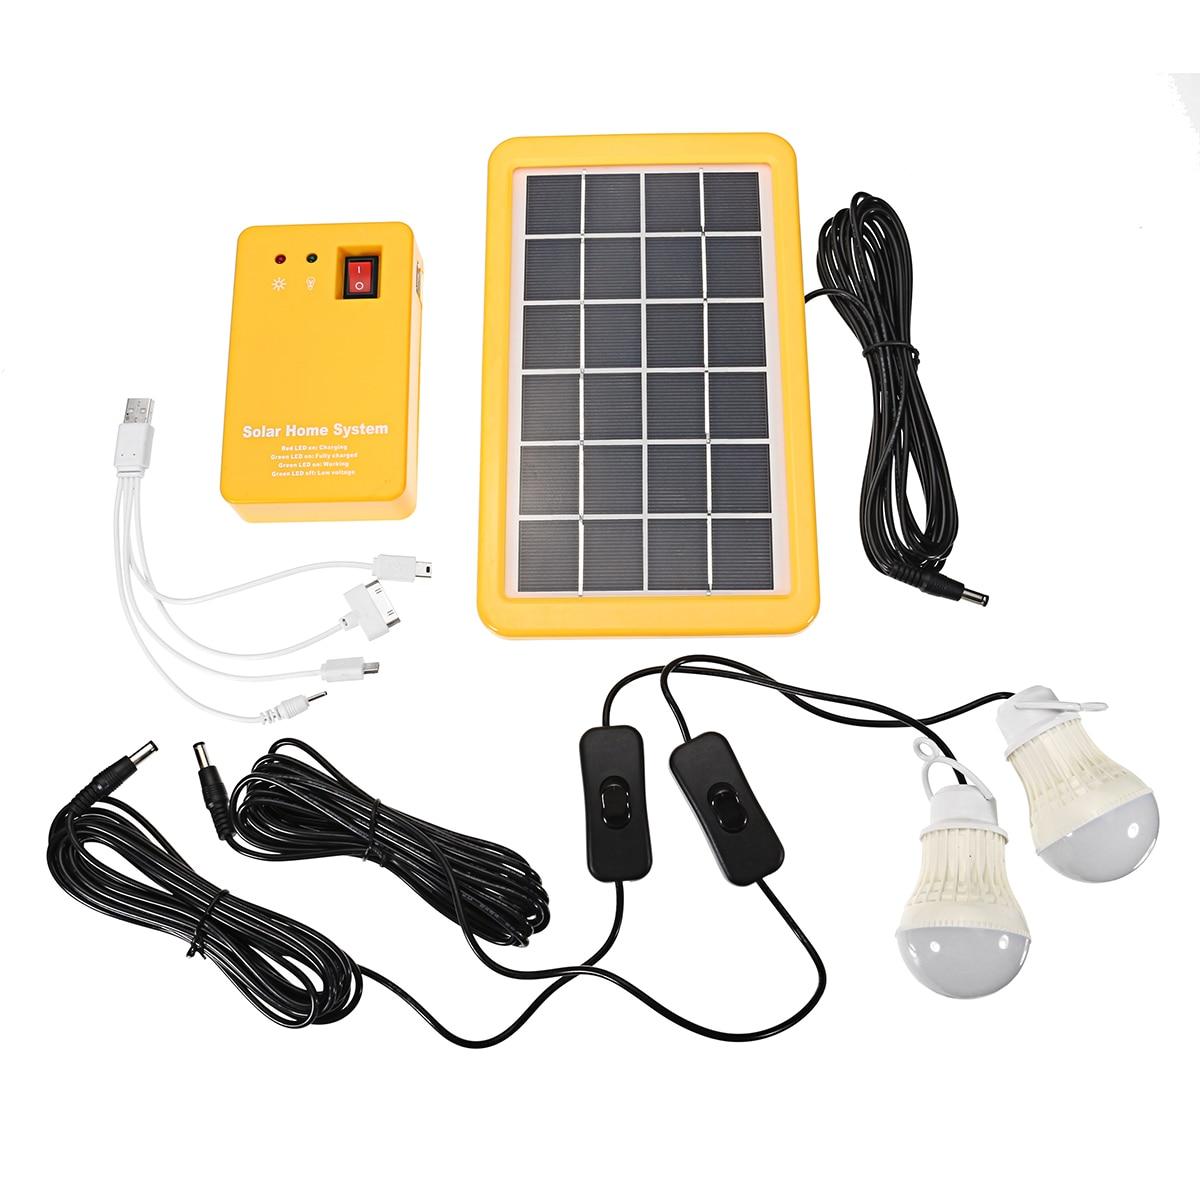 Smuxi 1 Set Solar Power Panel Generator LED Light Bulbs 5V USB Charger Home System Outdoor Garden Solar Lamps